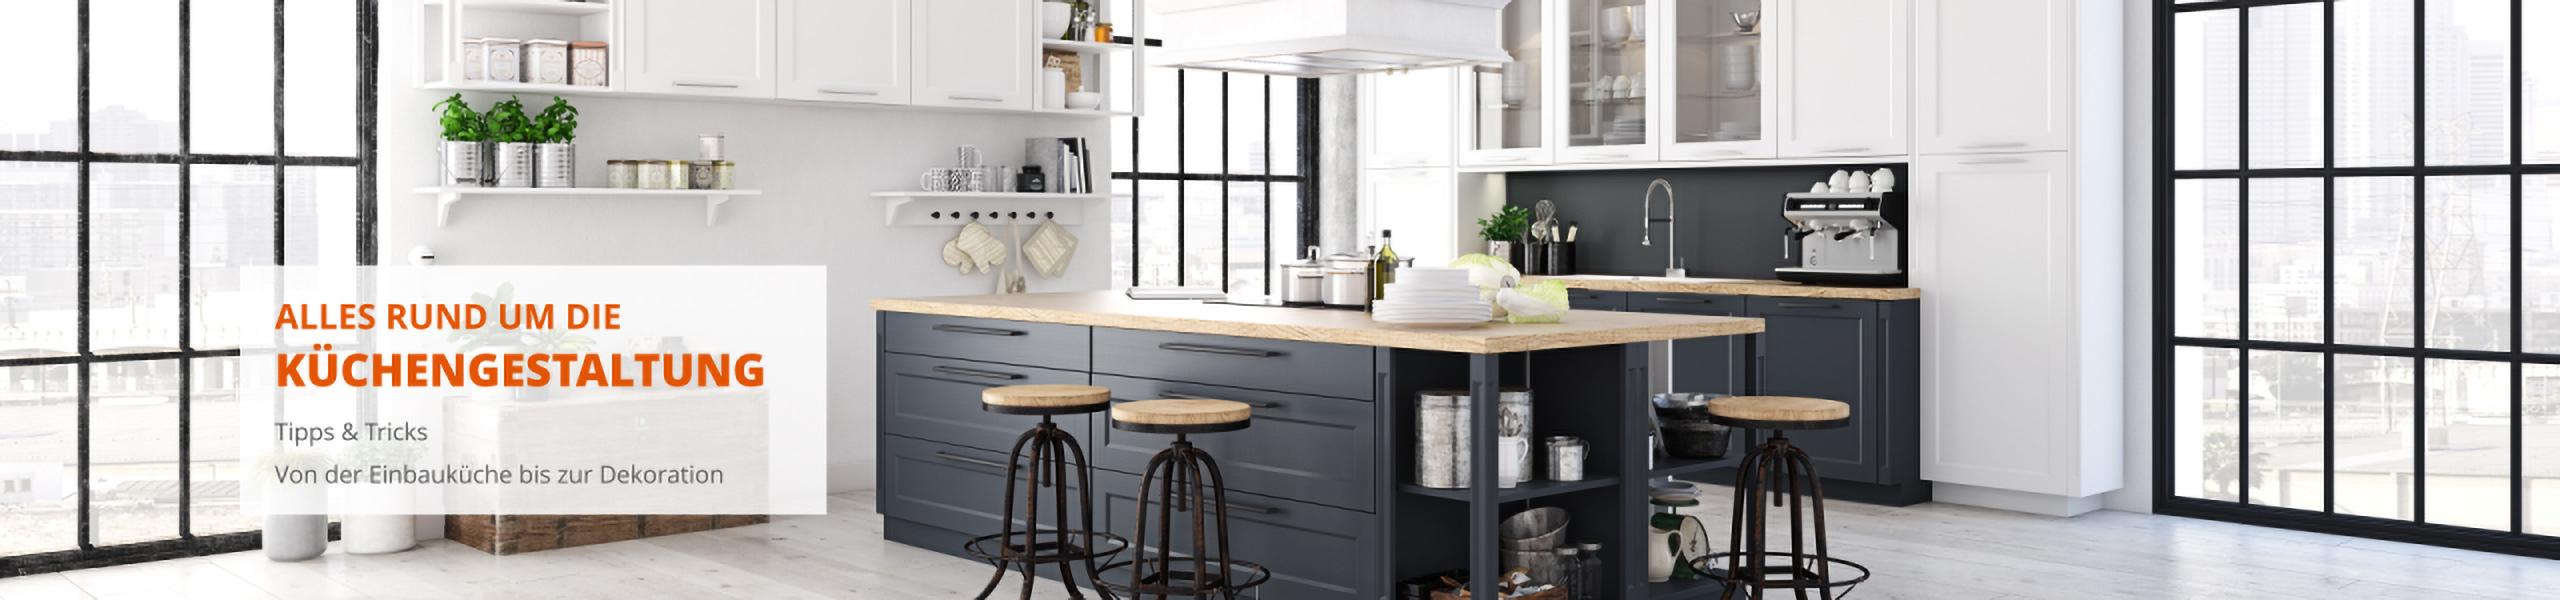 Kuchengestaltung Weser Wohnwelt